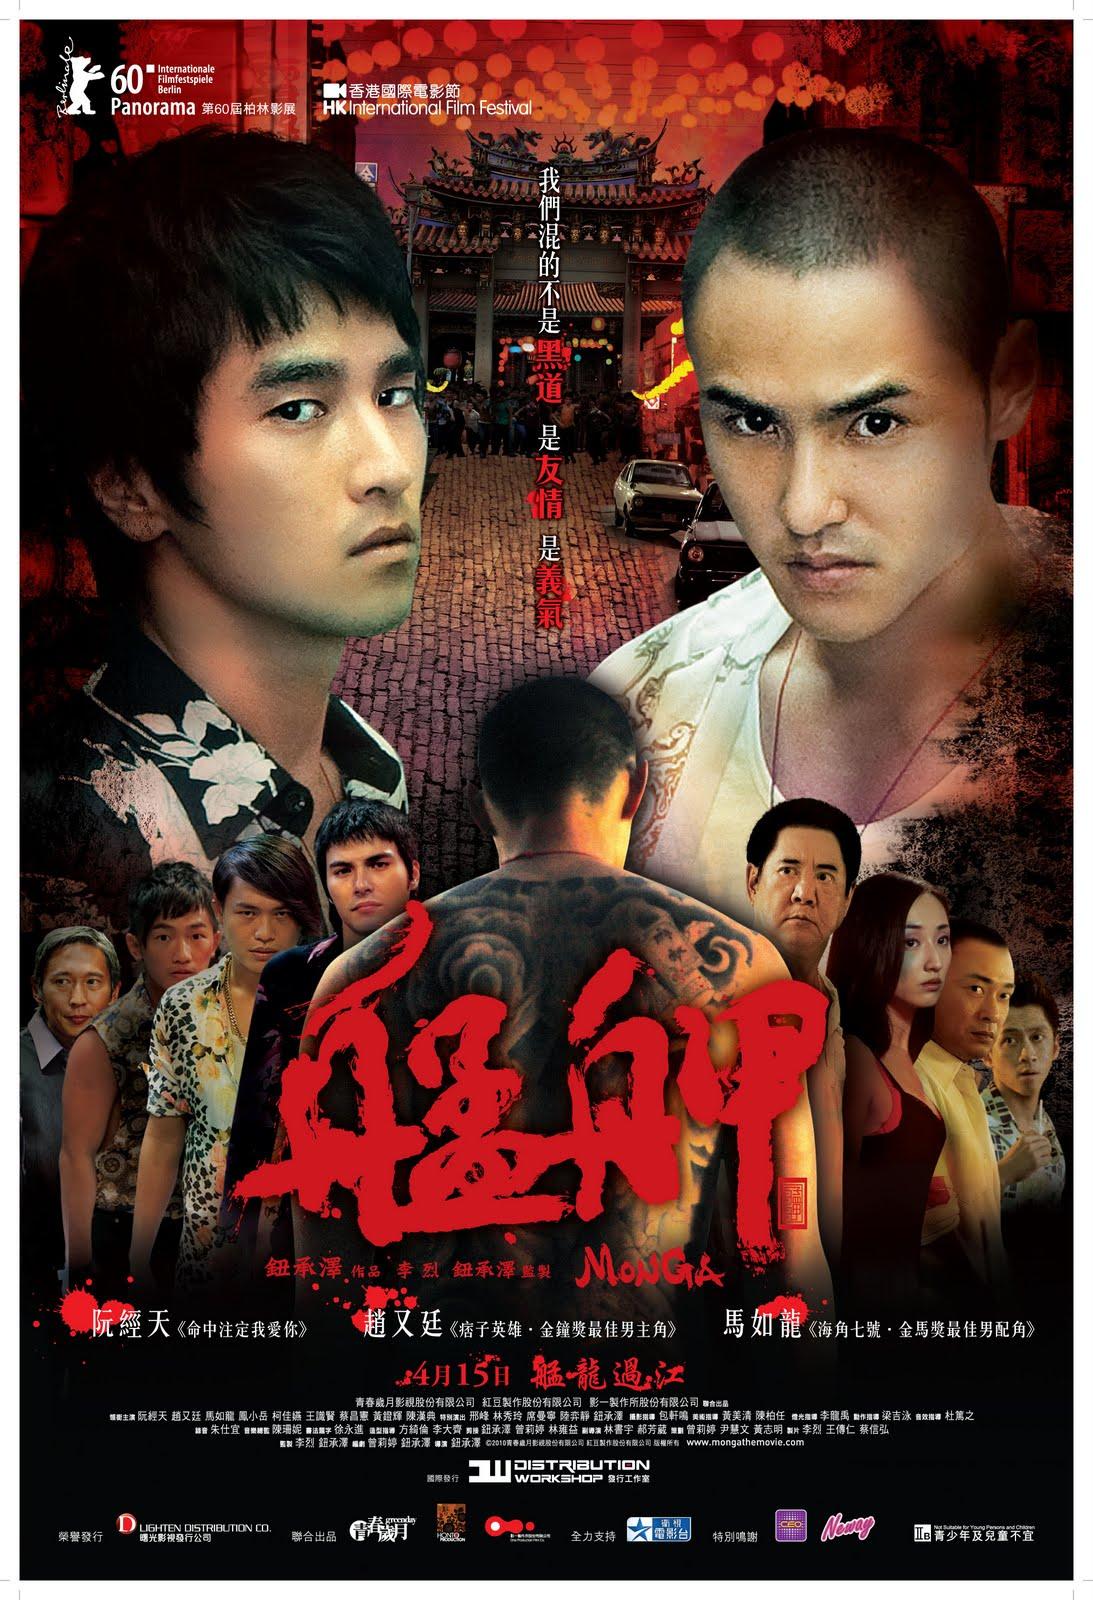 Life as Cinema: 《艋舺》:動人的情義矛盾